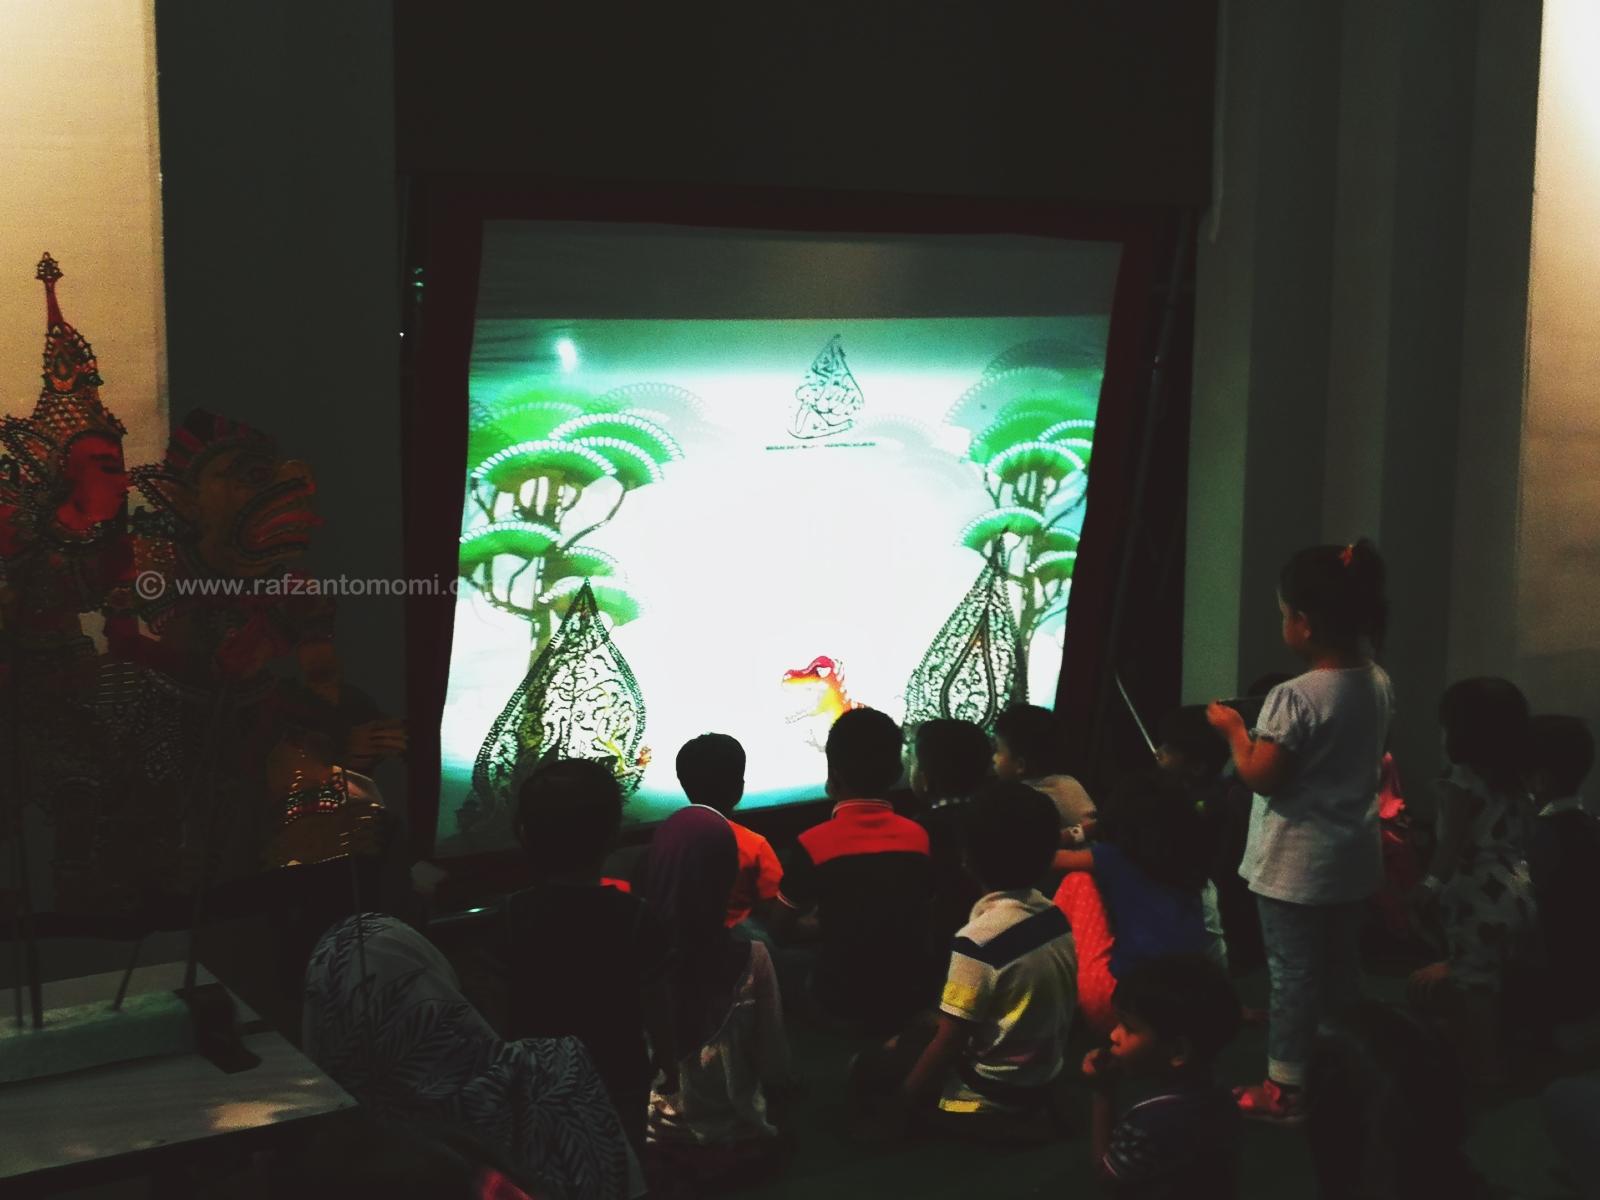 Sekitar Karnival Upin Ipin Di Maeps, Serdang